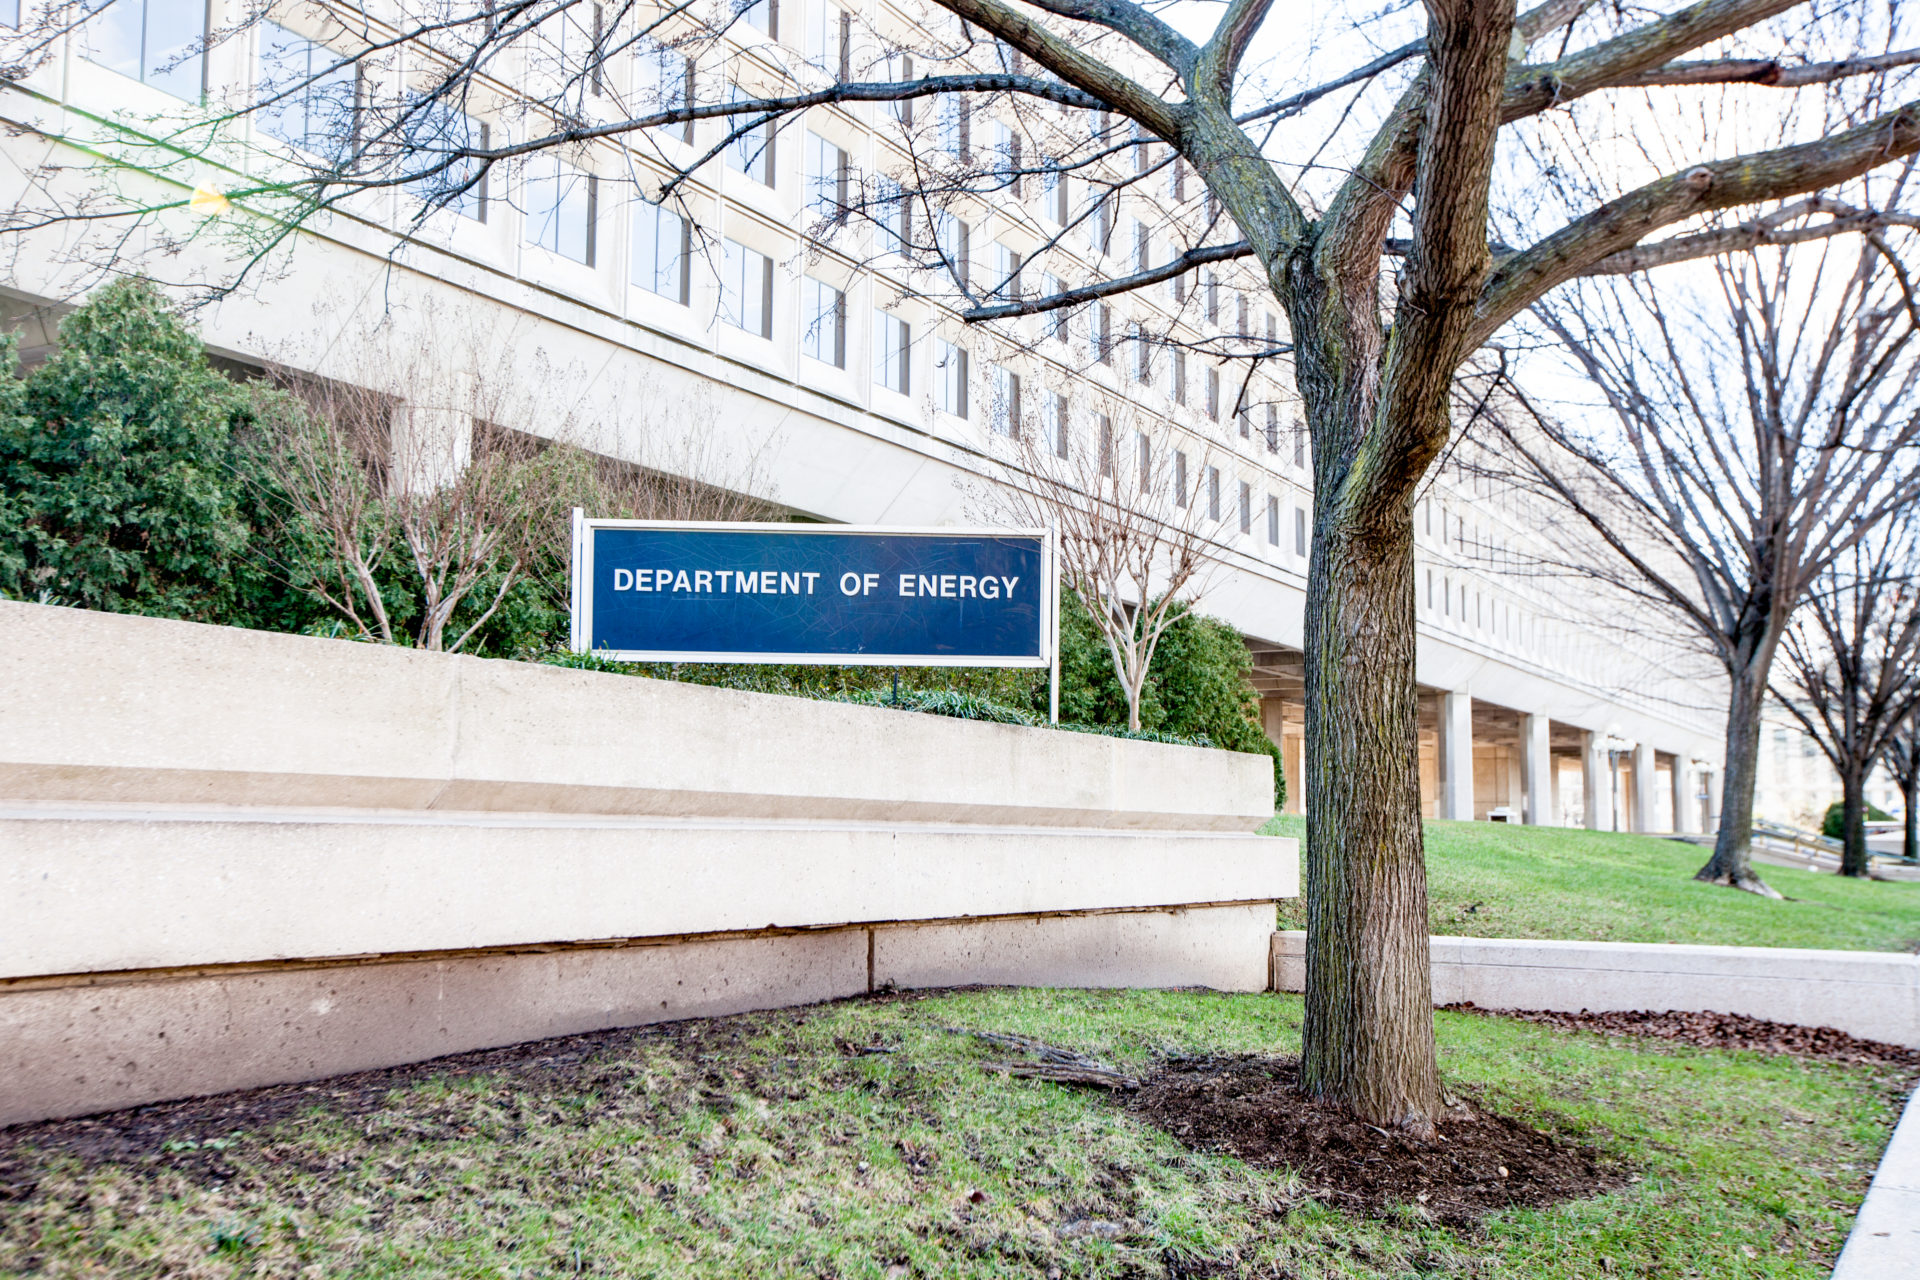 DOE Program's $3.7 Billion Loan Highlights Lack of Action on Other $40 Billion It Holds